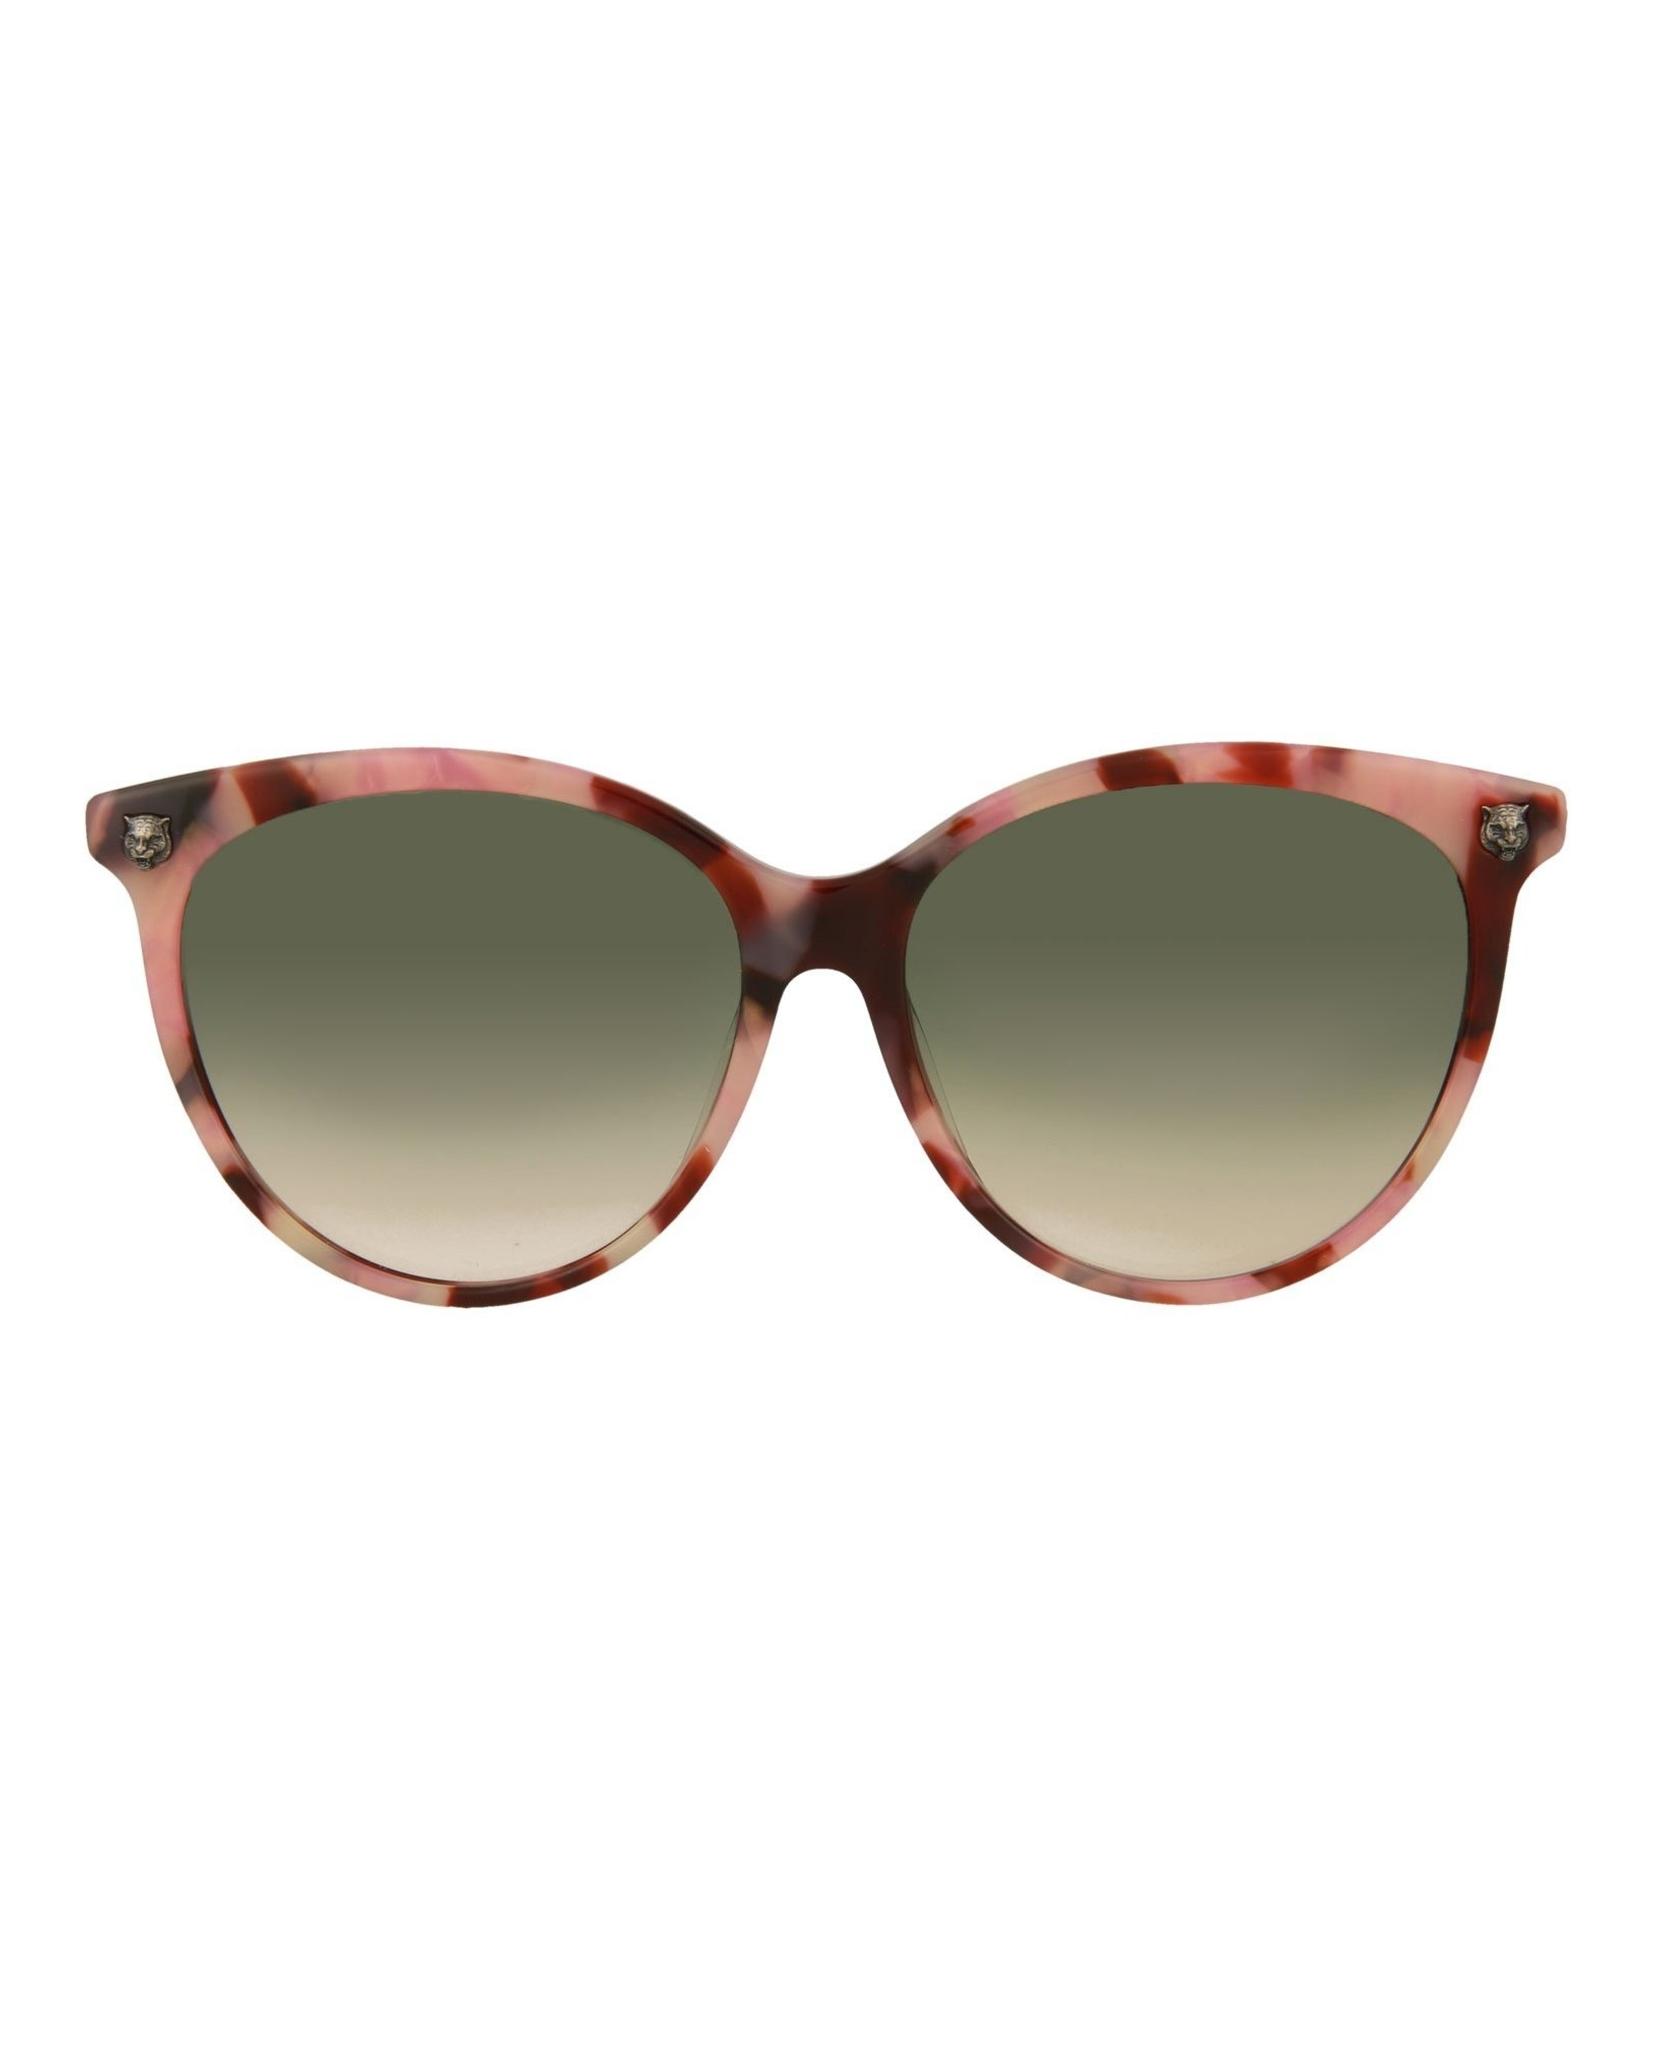 7bb86668b1 Gucci Womens Round Oval Sunglasses GG0223SK-30001799-004 ...